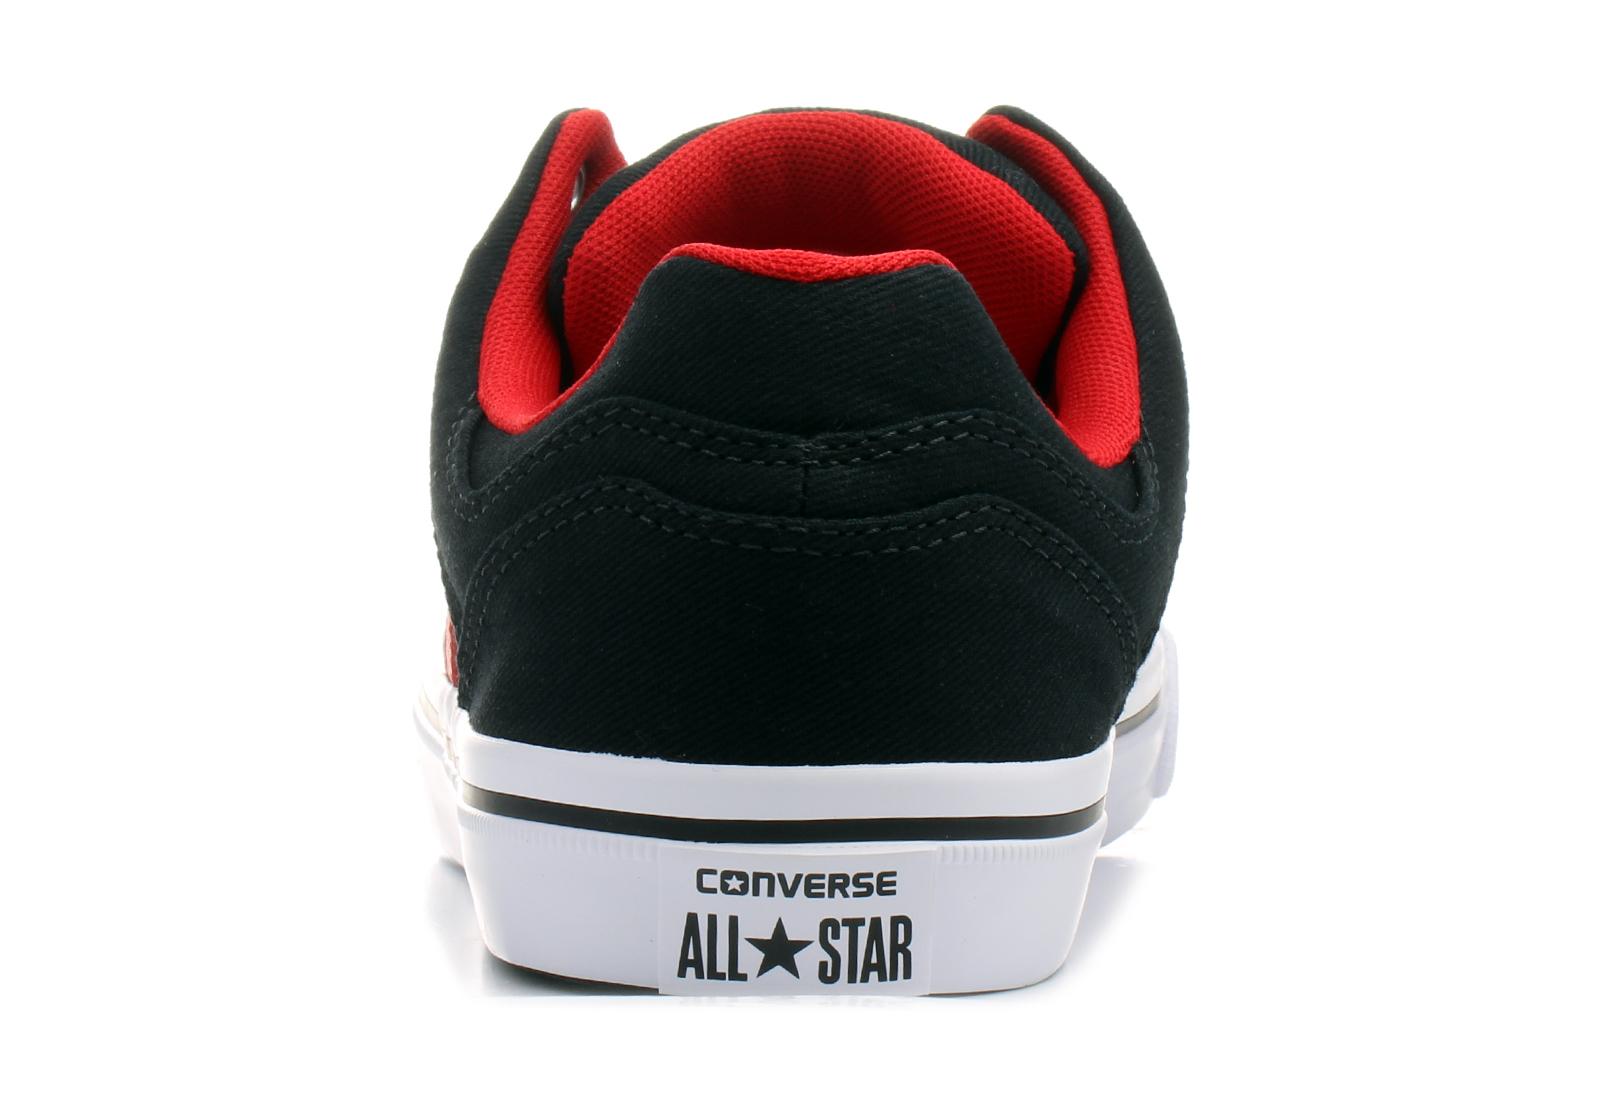 Converse Tornacipő - Cons El Distrito - 159787C - Office Shoes ... 823a6669de